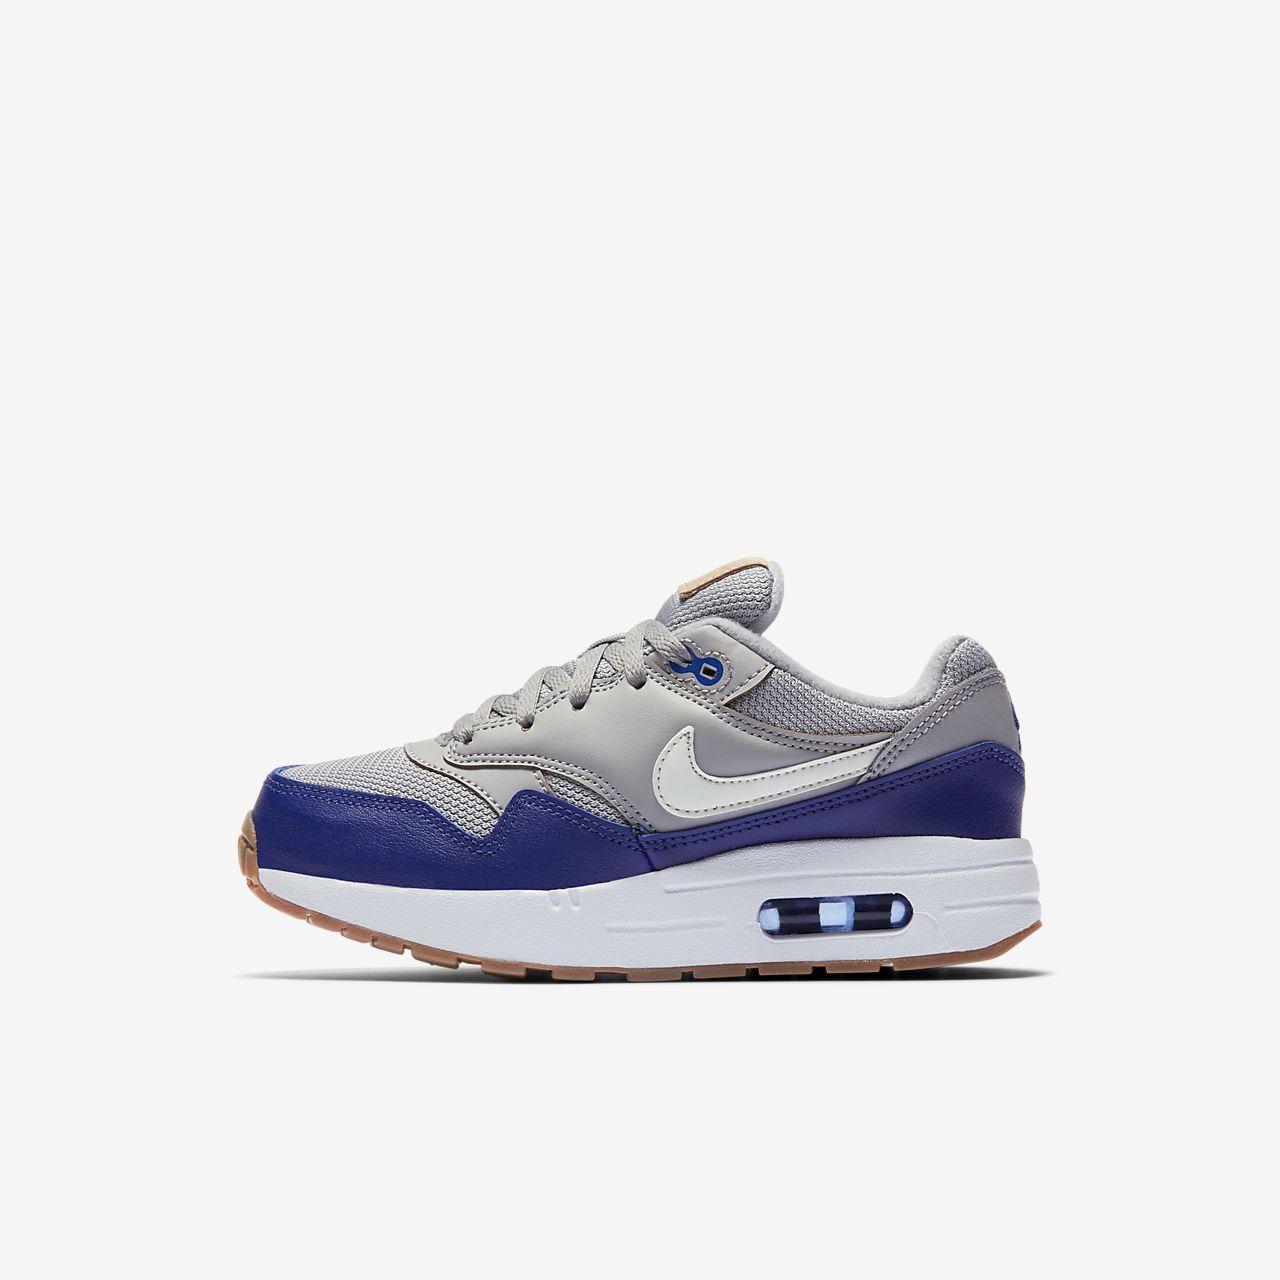 fb66368c Nike Air Max 1 sko for små barn. Nike.com NO